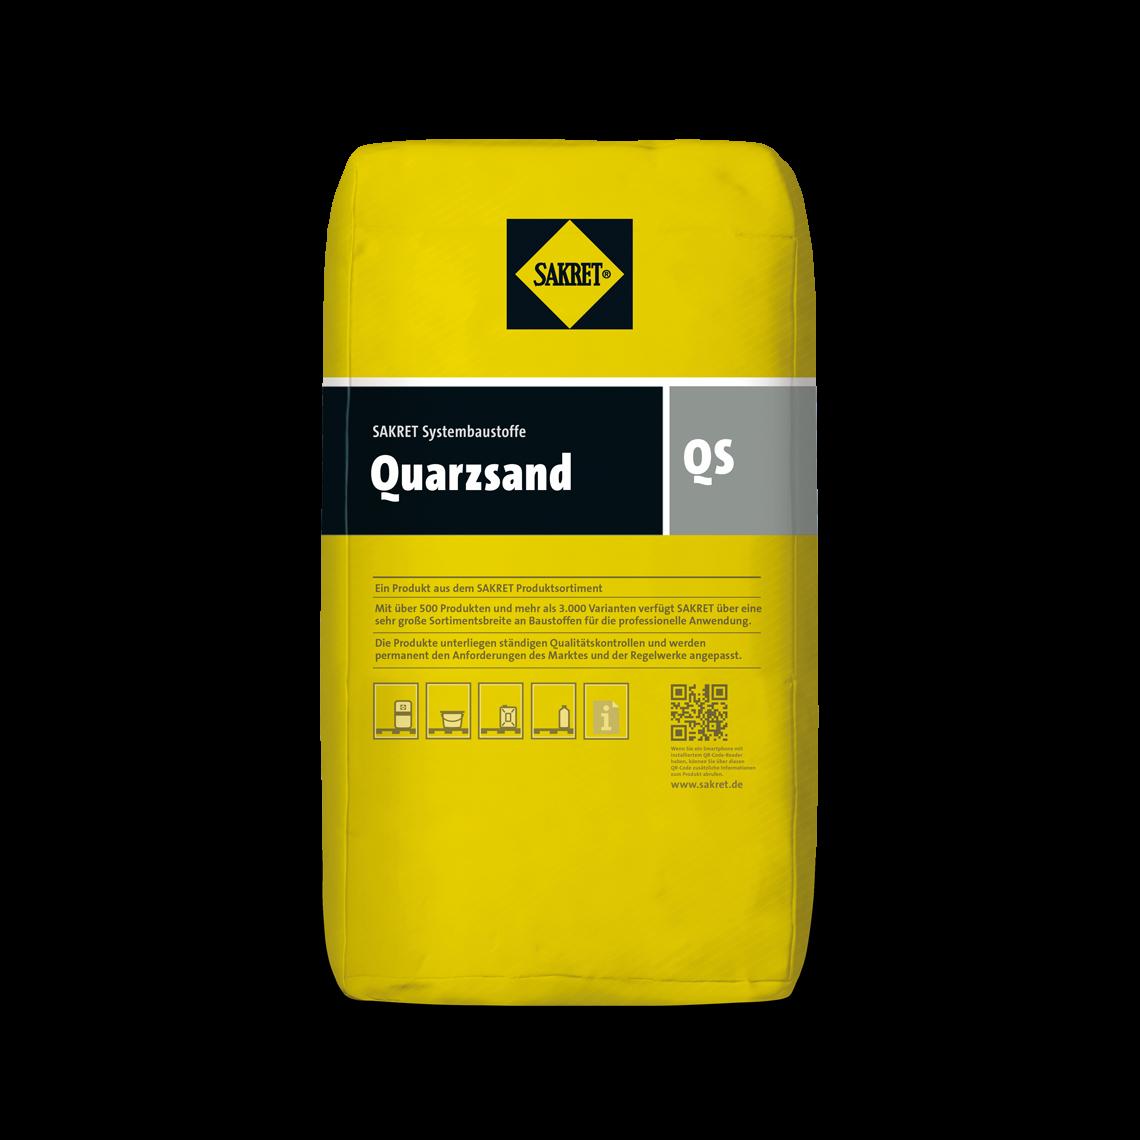 AbbildungSAKRET Quarzsand QS